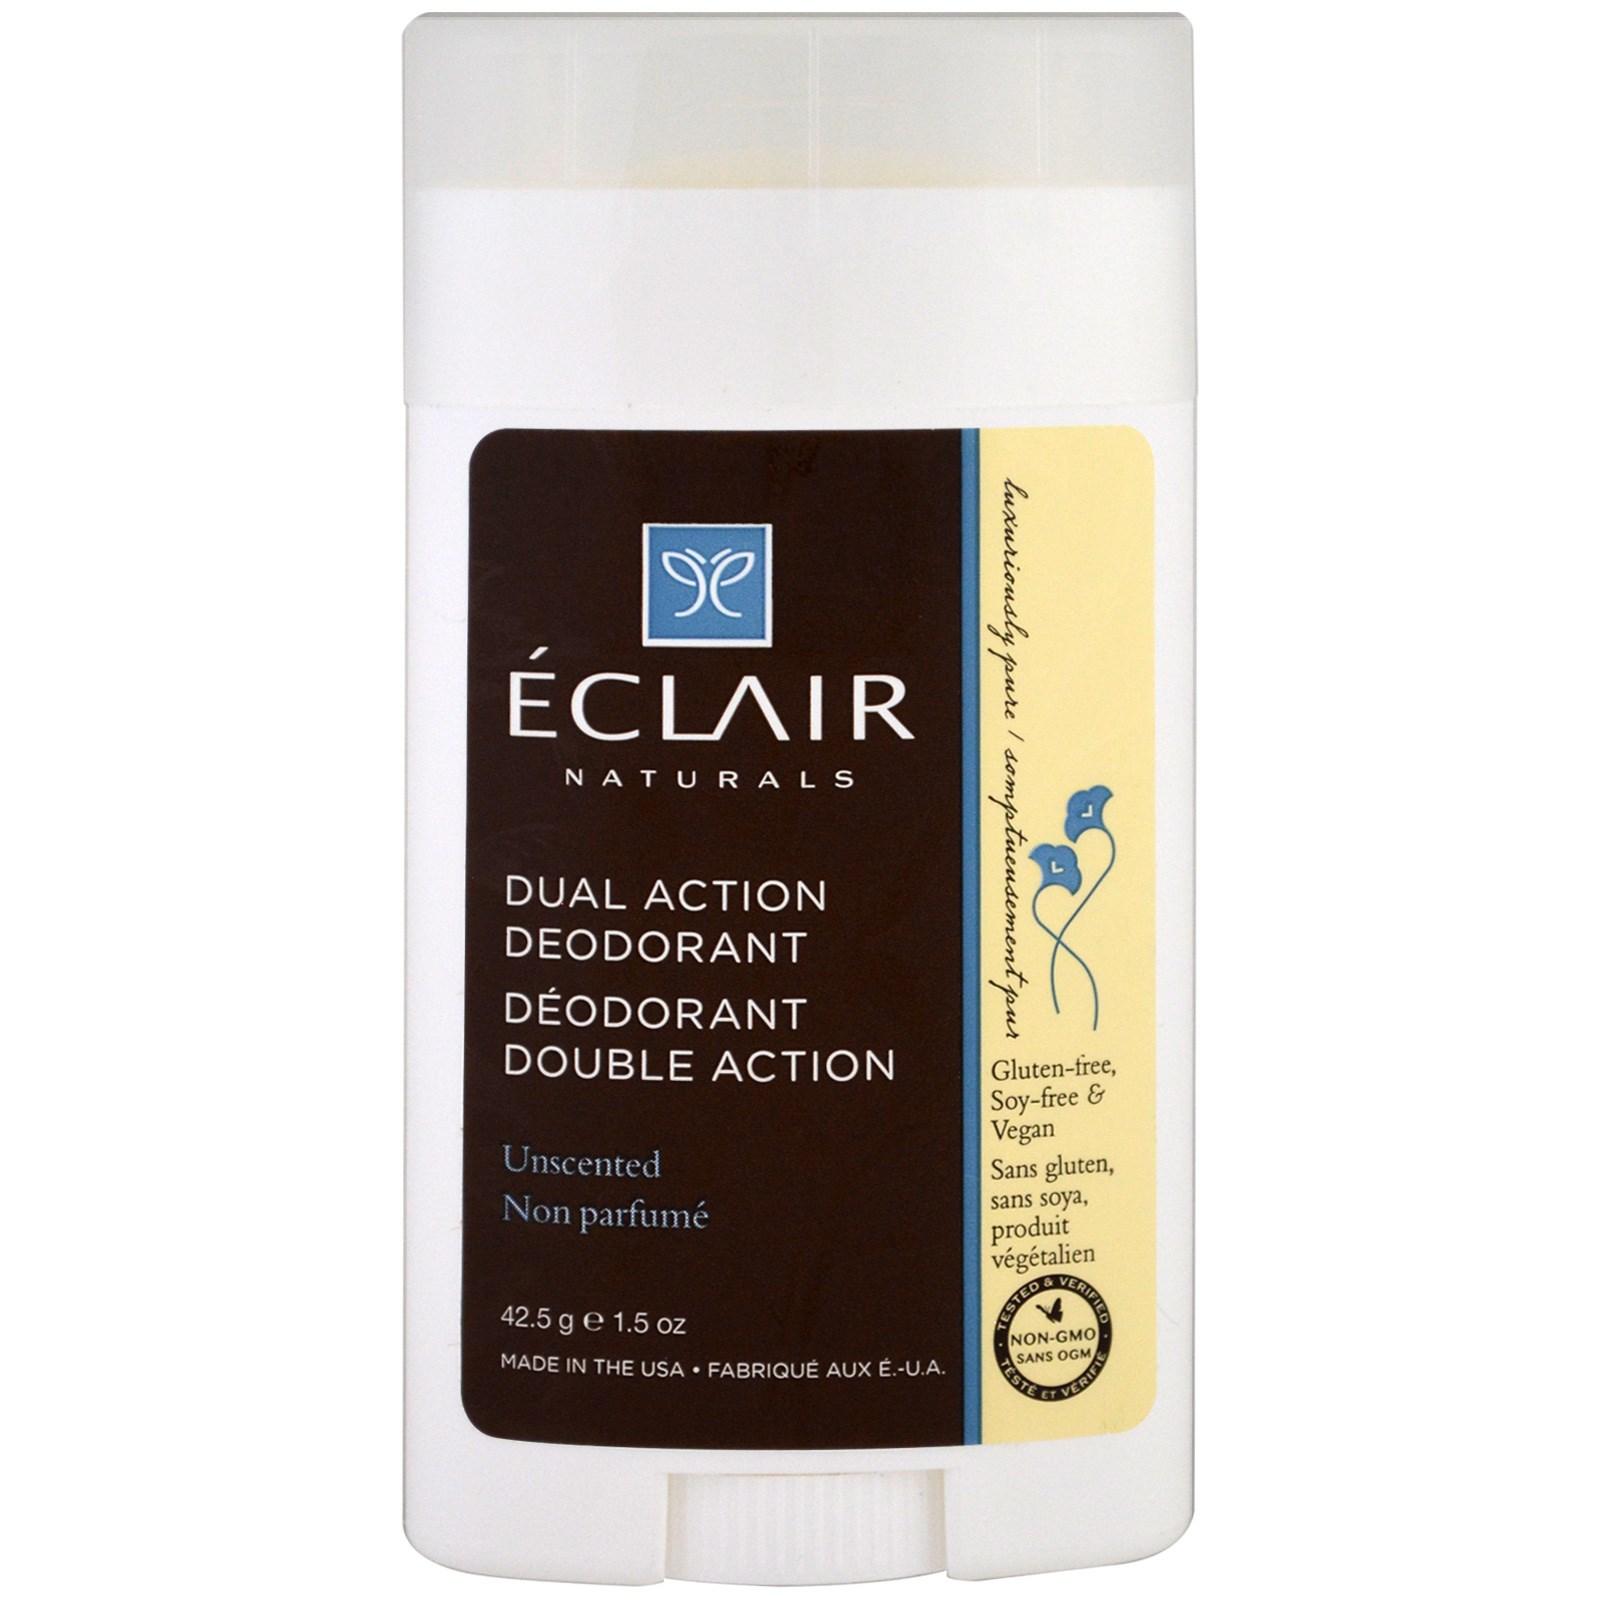 Eclair Naturals, Дезодорант двойного действия, без запаха, 1,5 унц. (42,5 г)